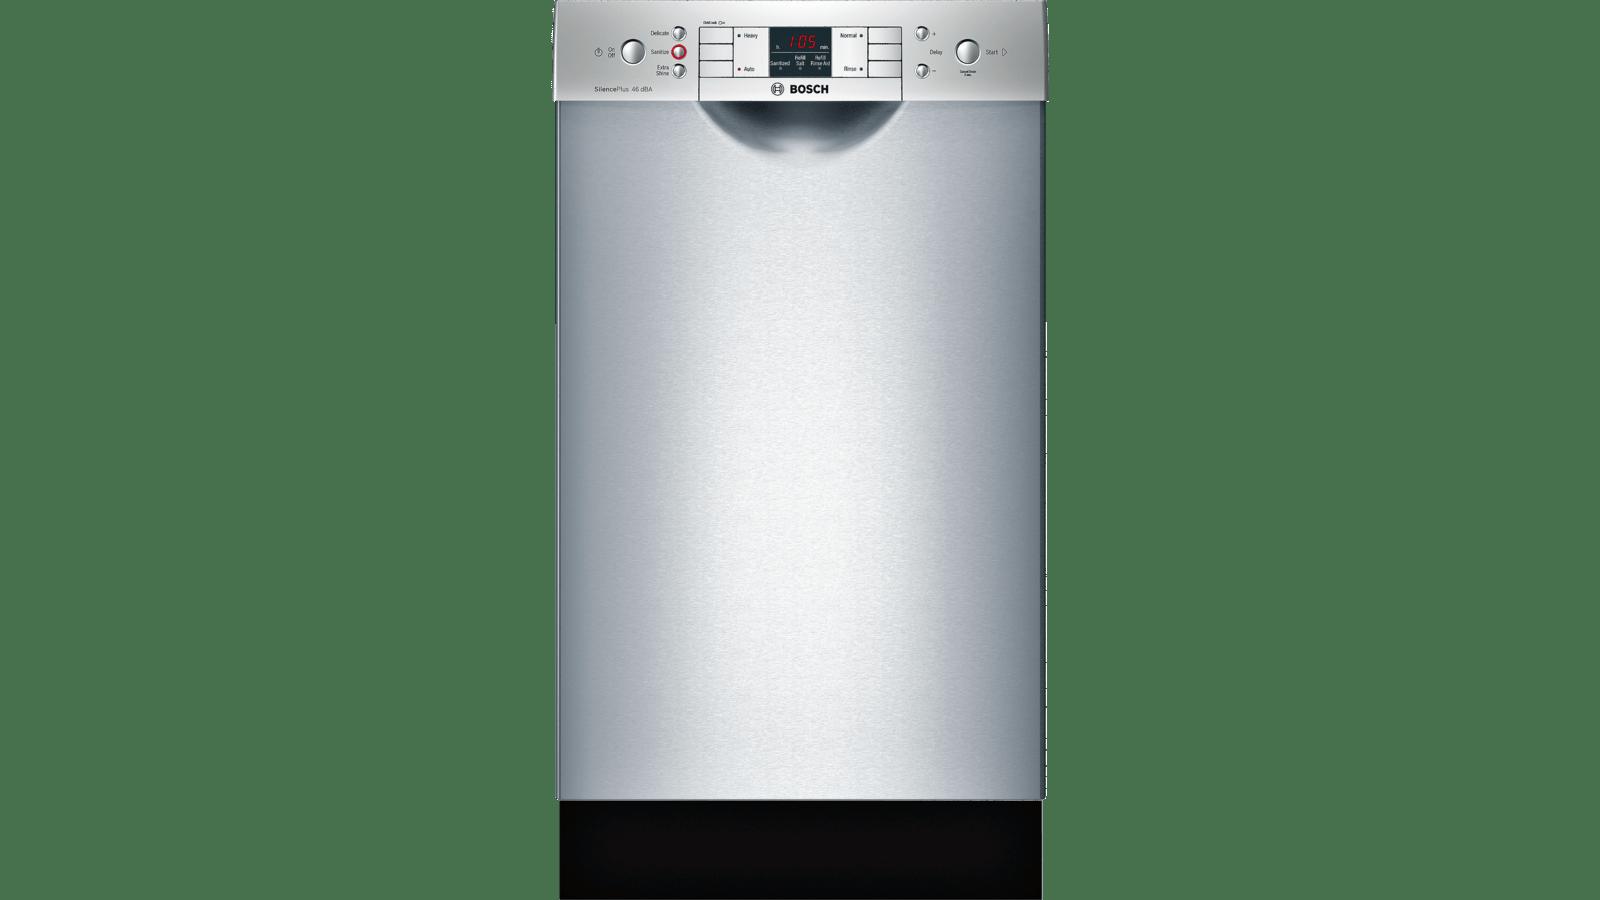 300 Series Dishwasher 17 3 4 Stainless Steel Spe53u55uc